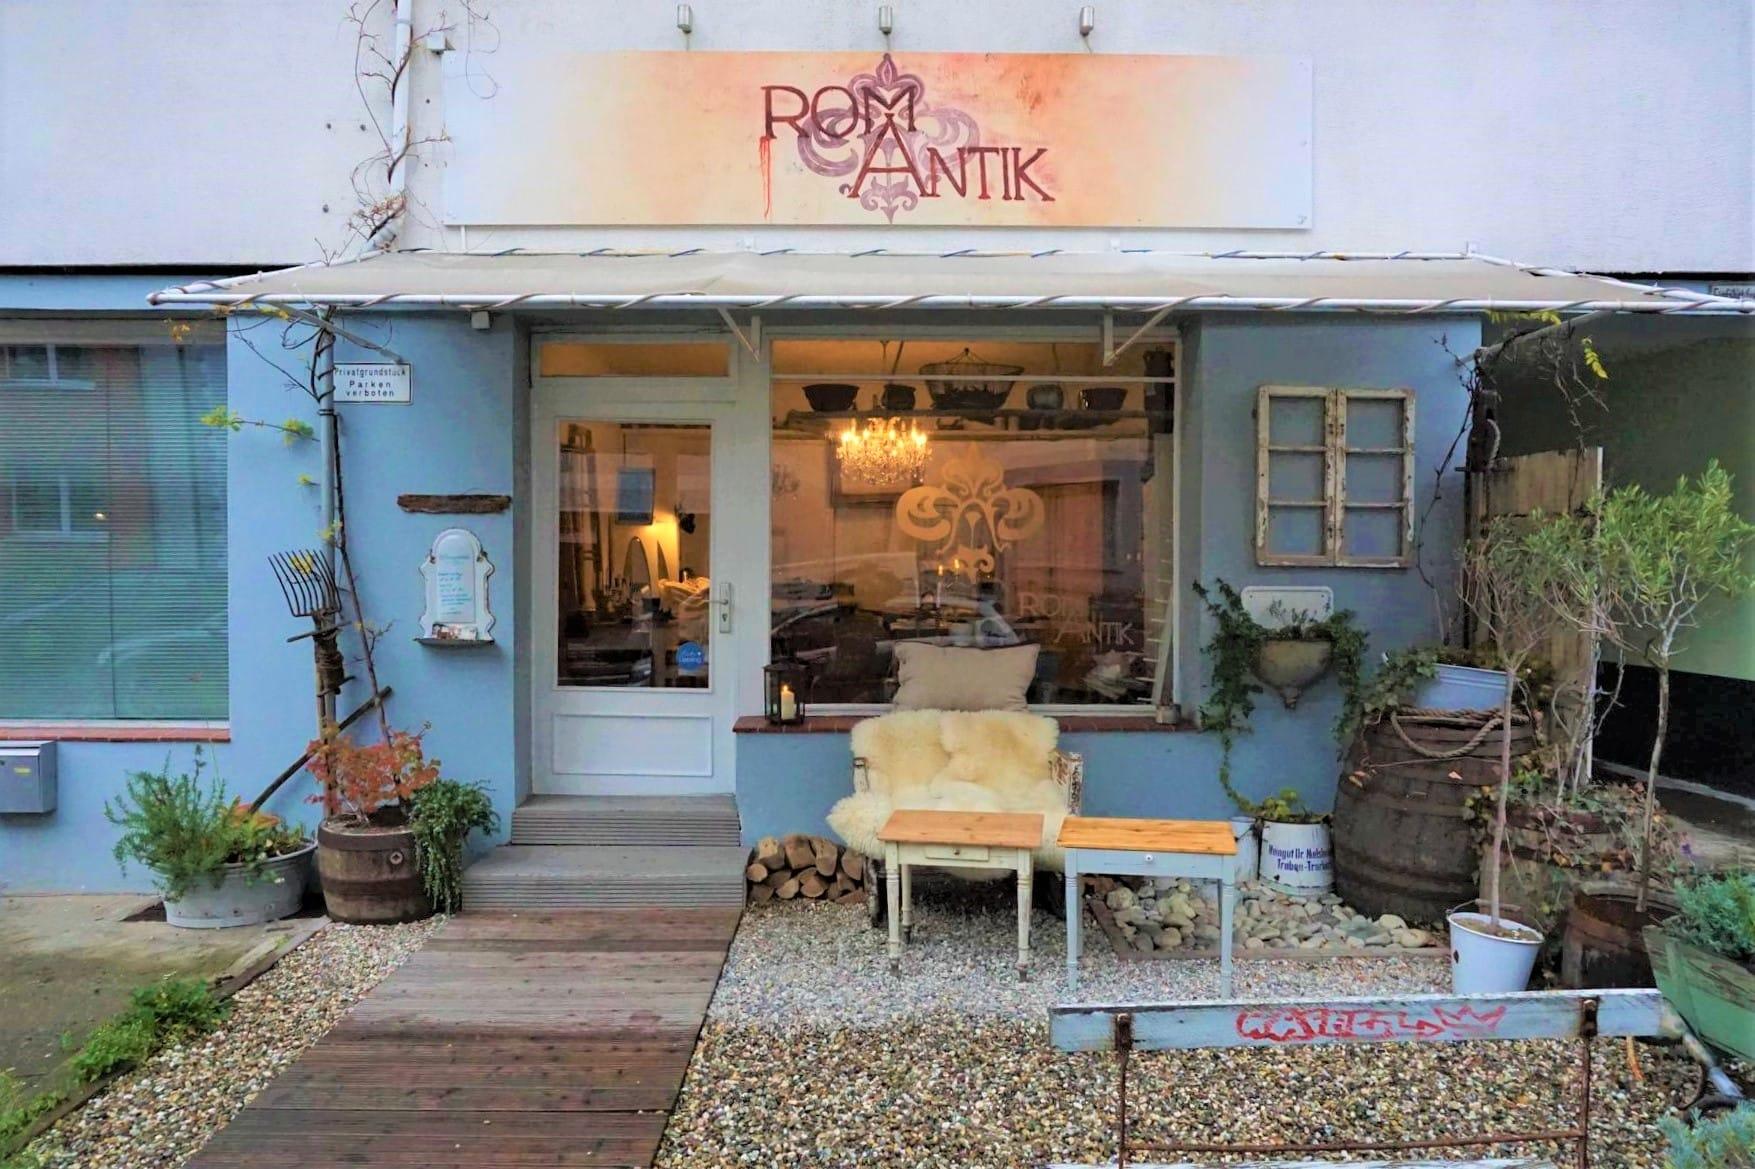 Style Hannover RomAntik B - RomAntik - restaurierte Möbel & mehr